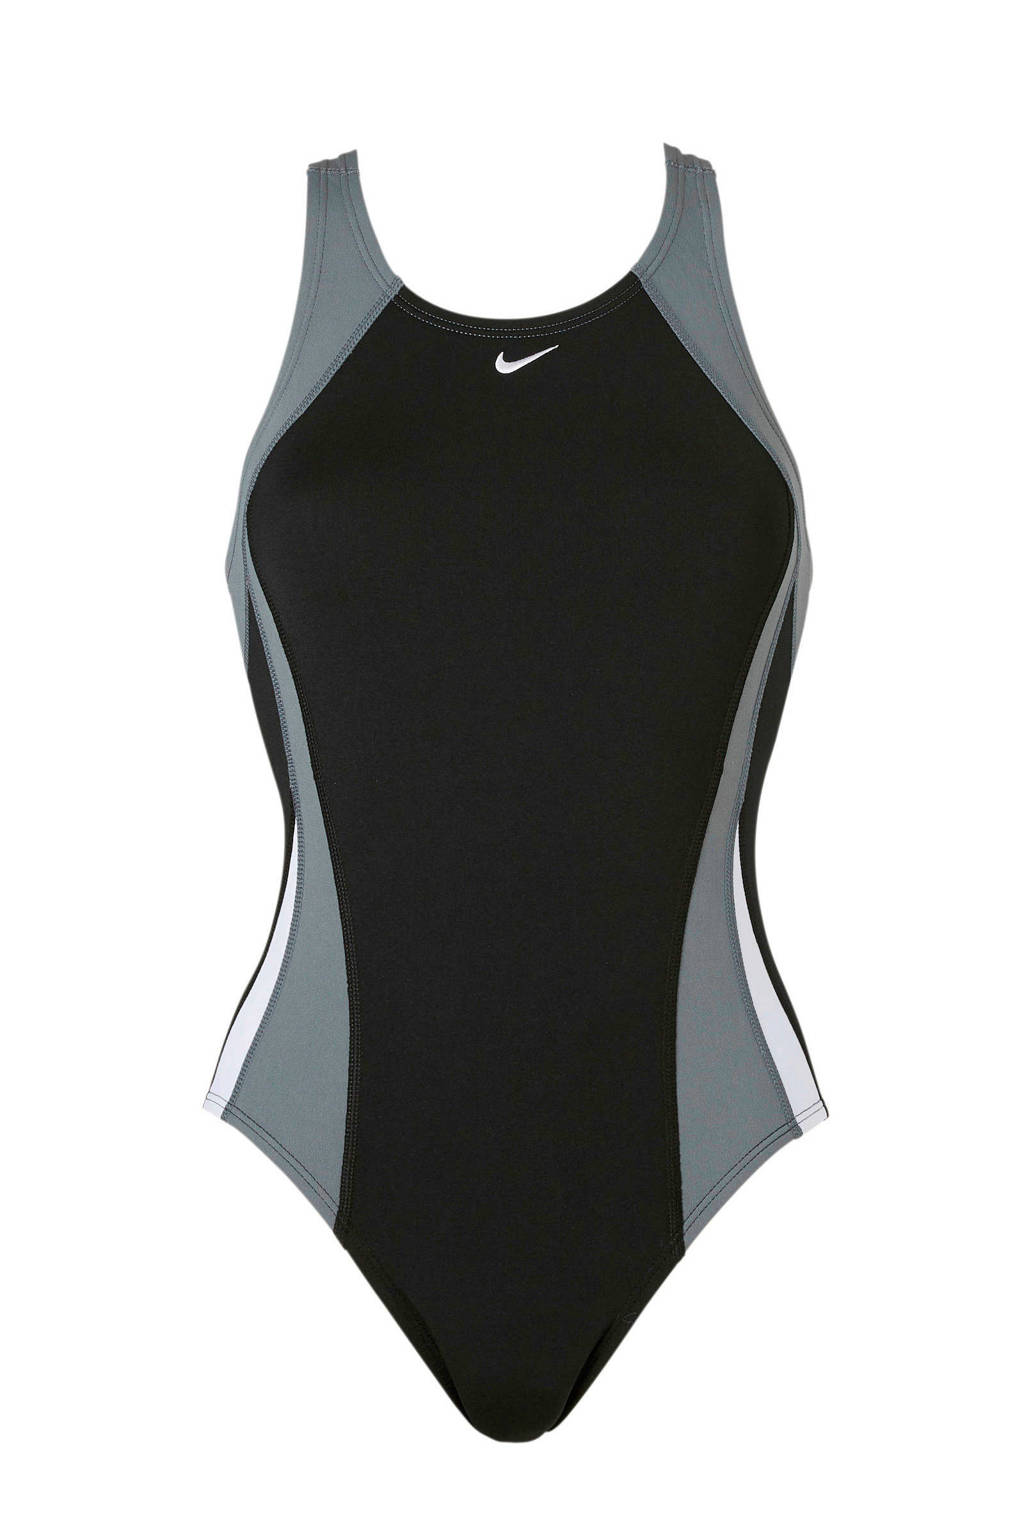 Nike sportbadpak gevoerd zwart, Zwart/grijs/wit